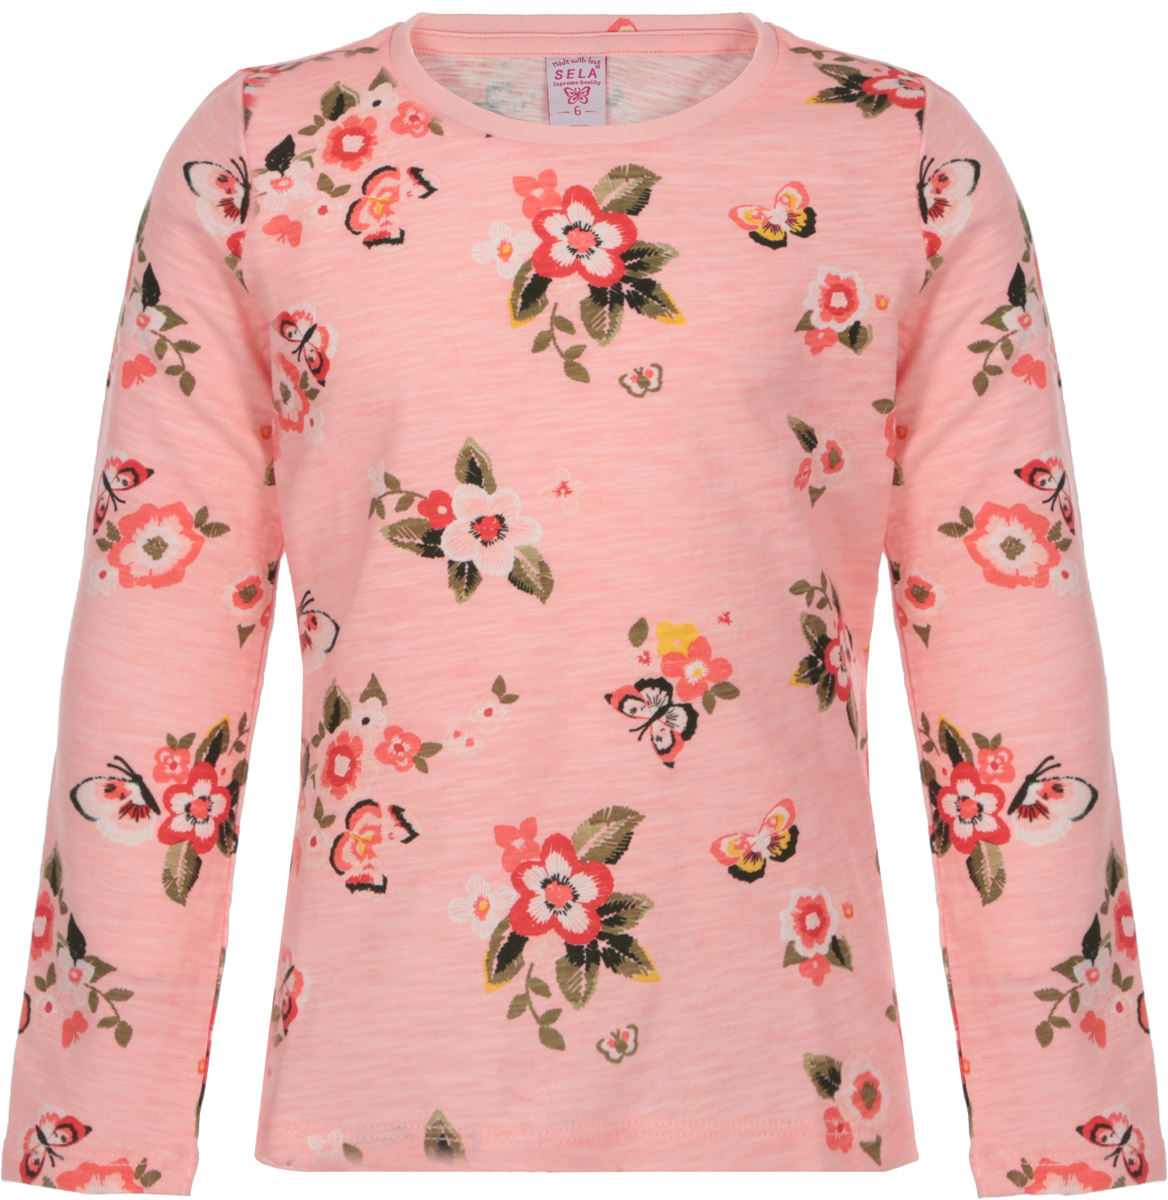 Джемпер для девочки Sela, цвет: розовый. T-511/479-8122. Размер 98T-511/479-8122